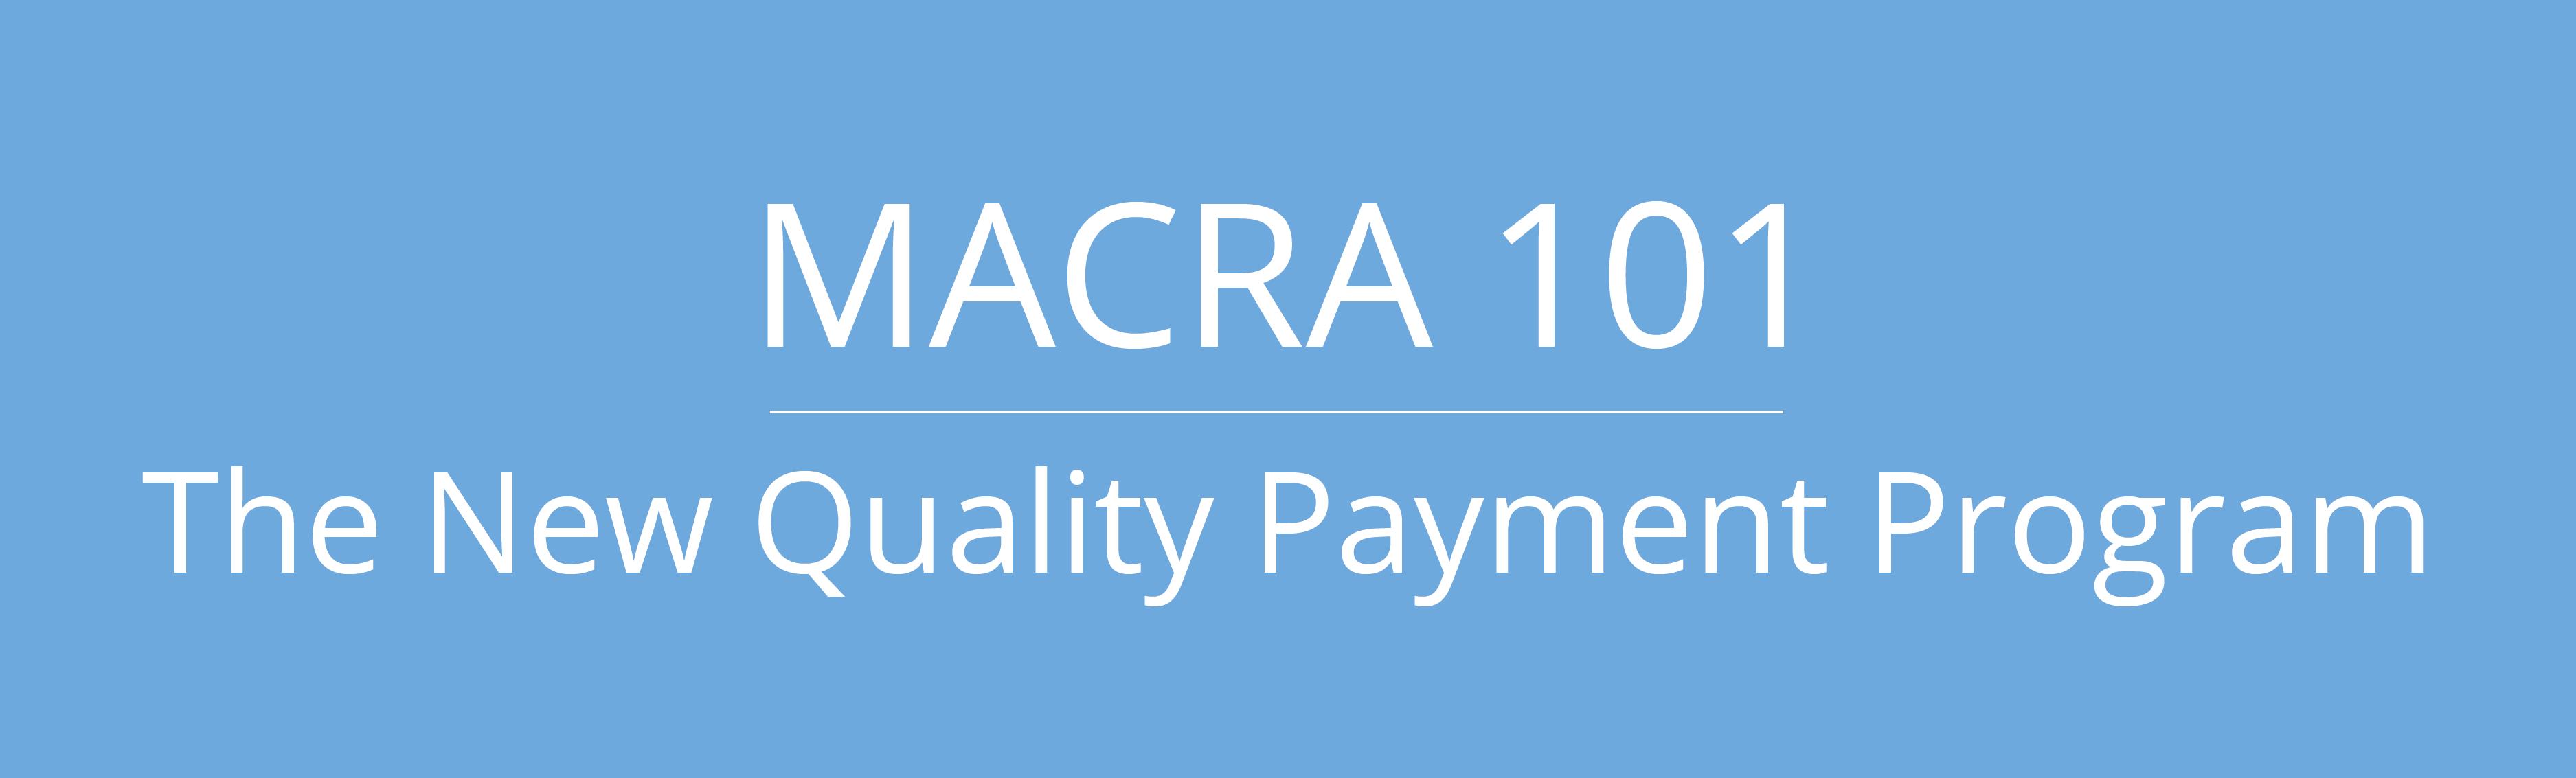 macra_101_image-01